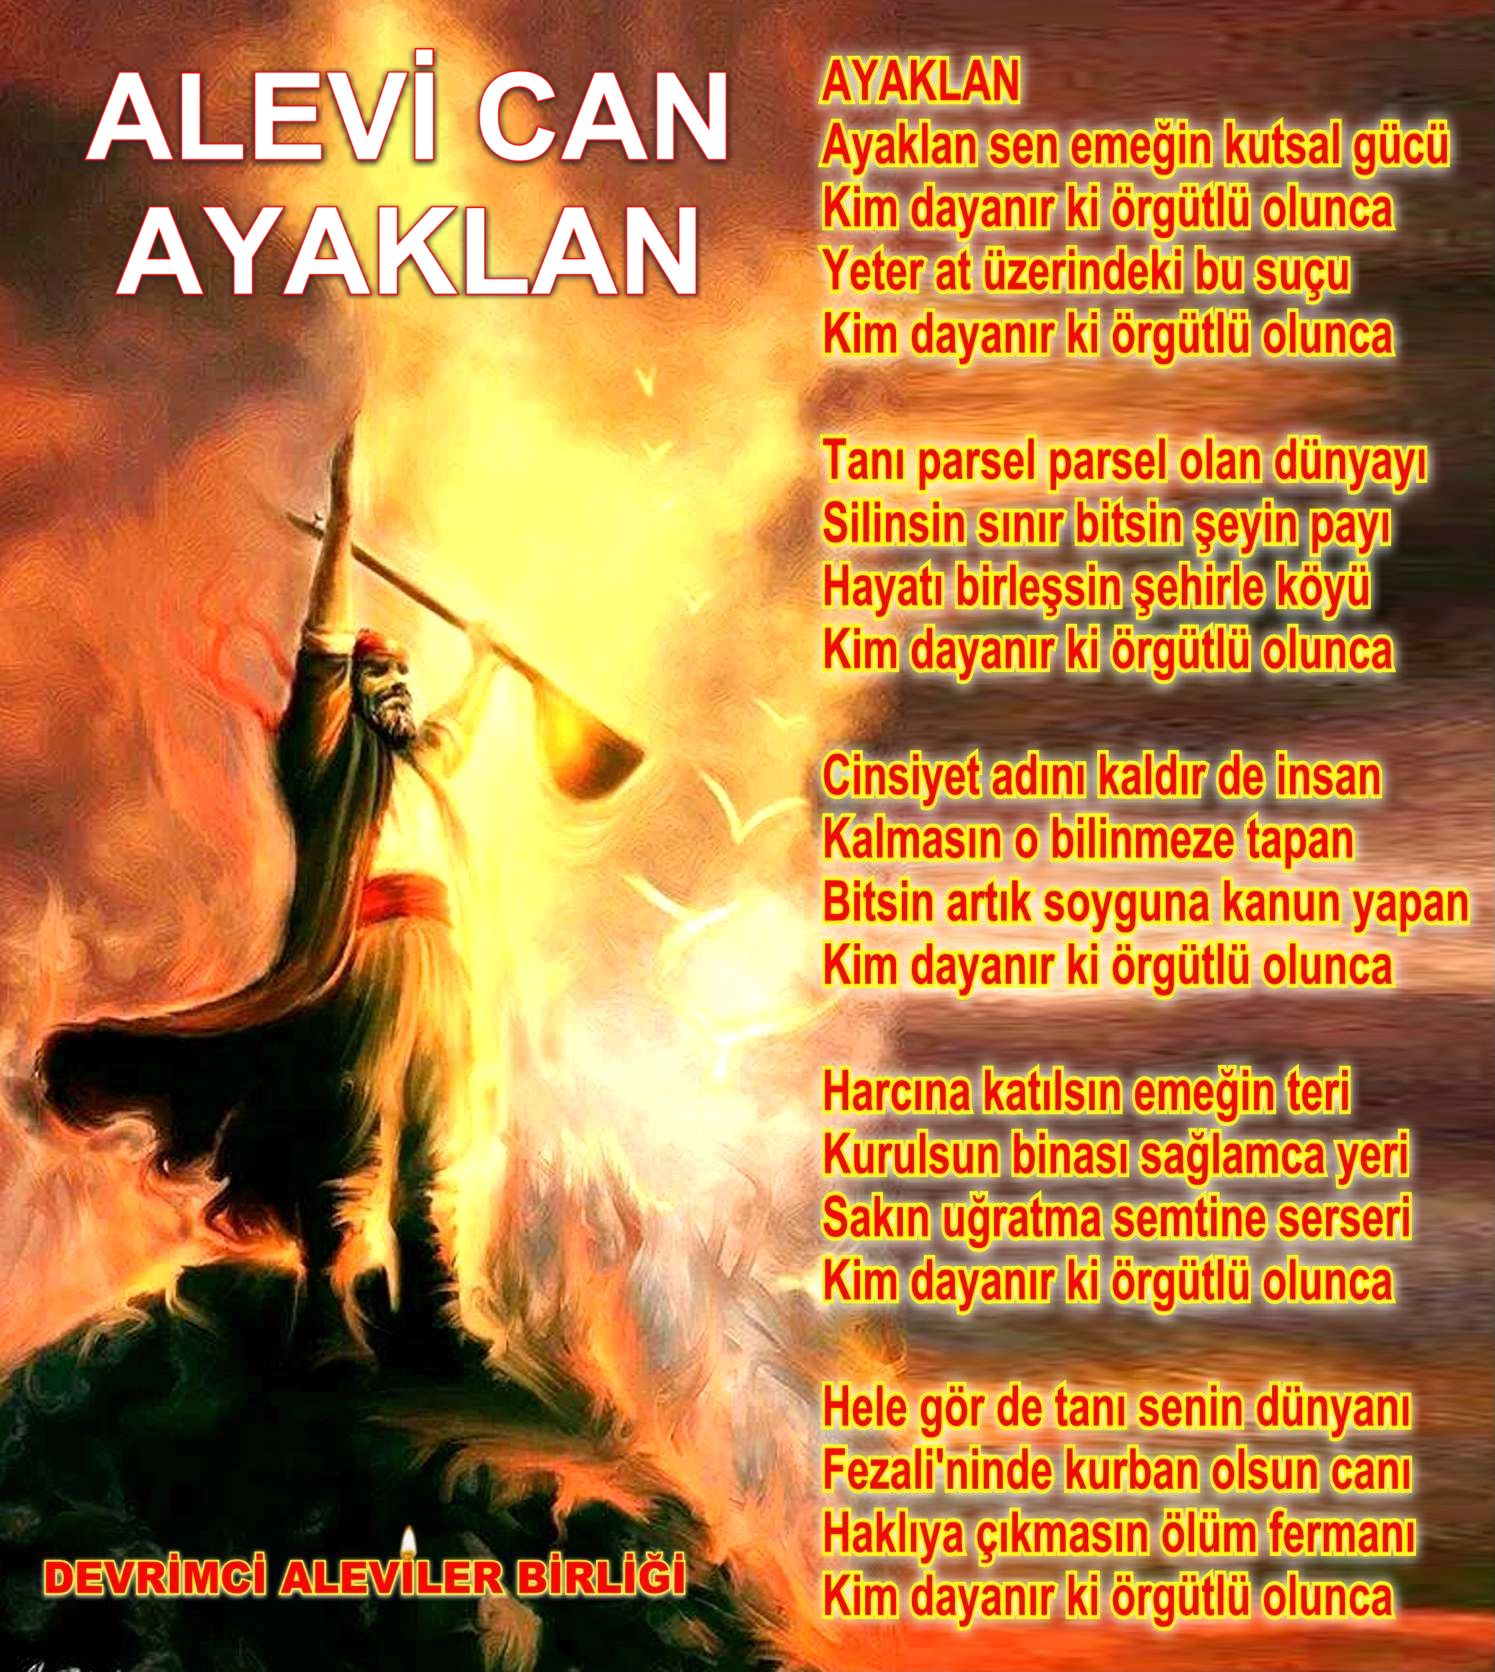 Alevi Bektaşi Kızılbaş Pir Sultan Devrimci Aleviler Birliği DAB Ayaklan Alevi can